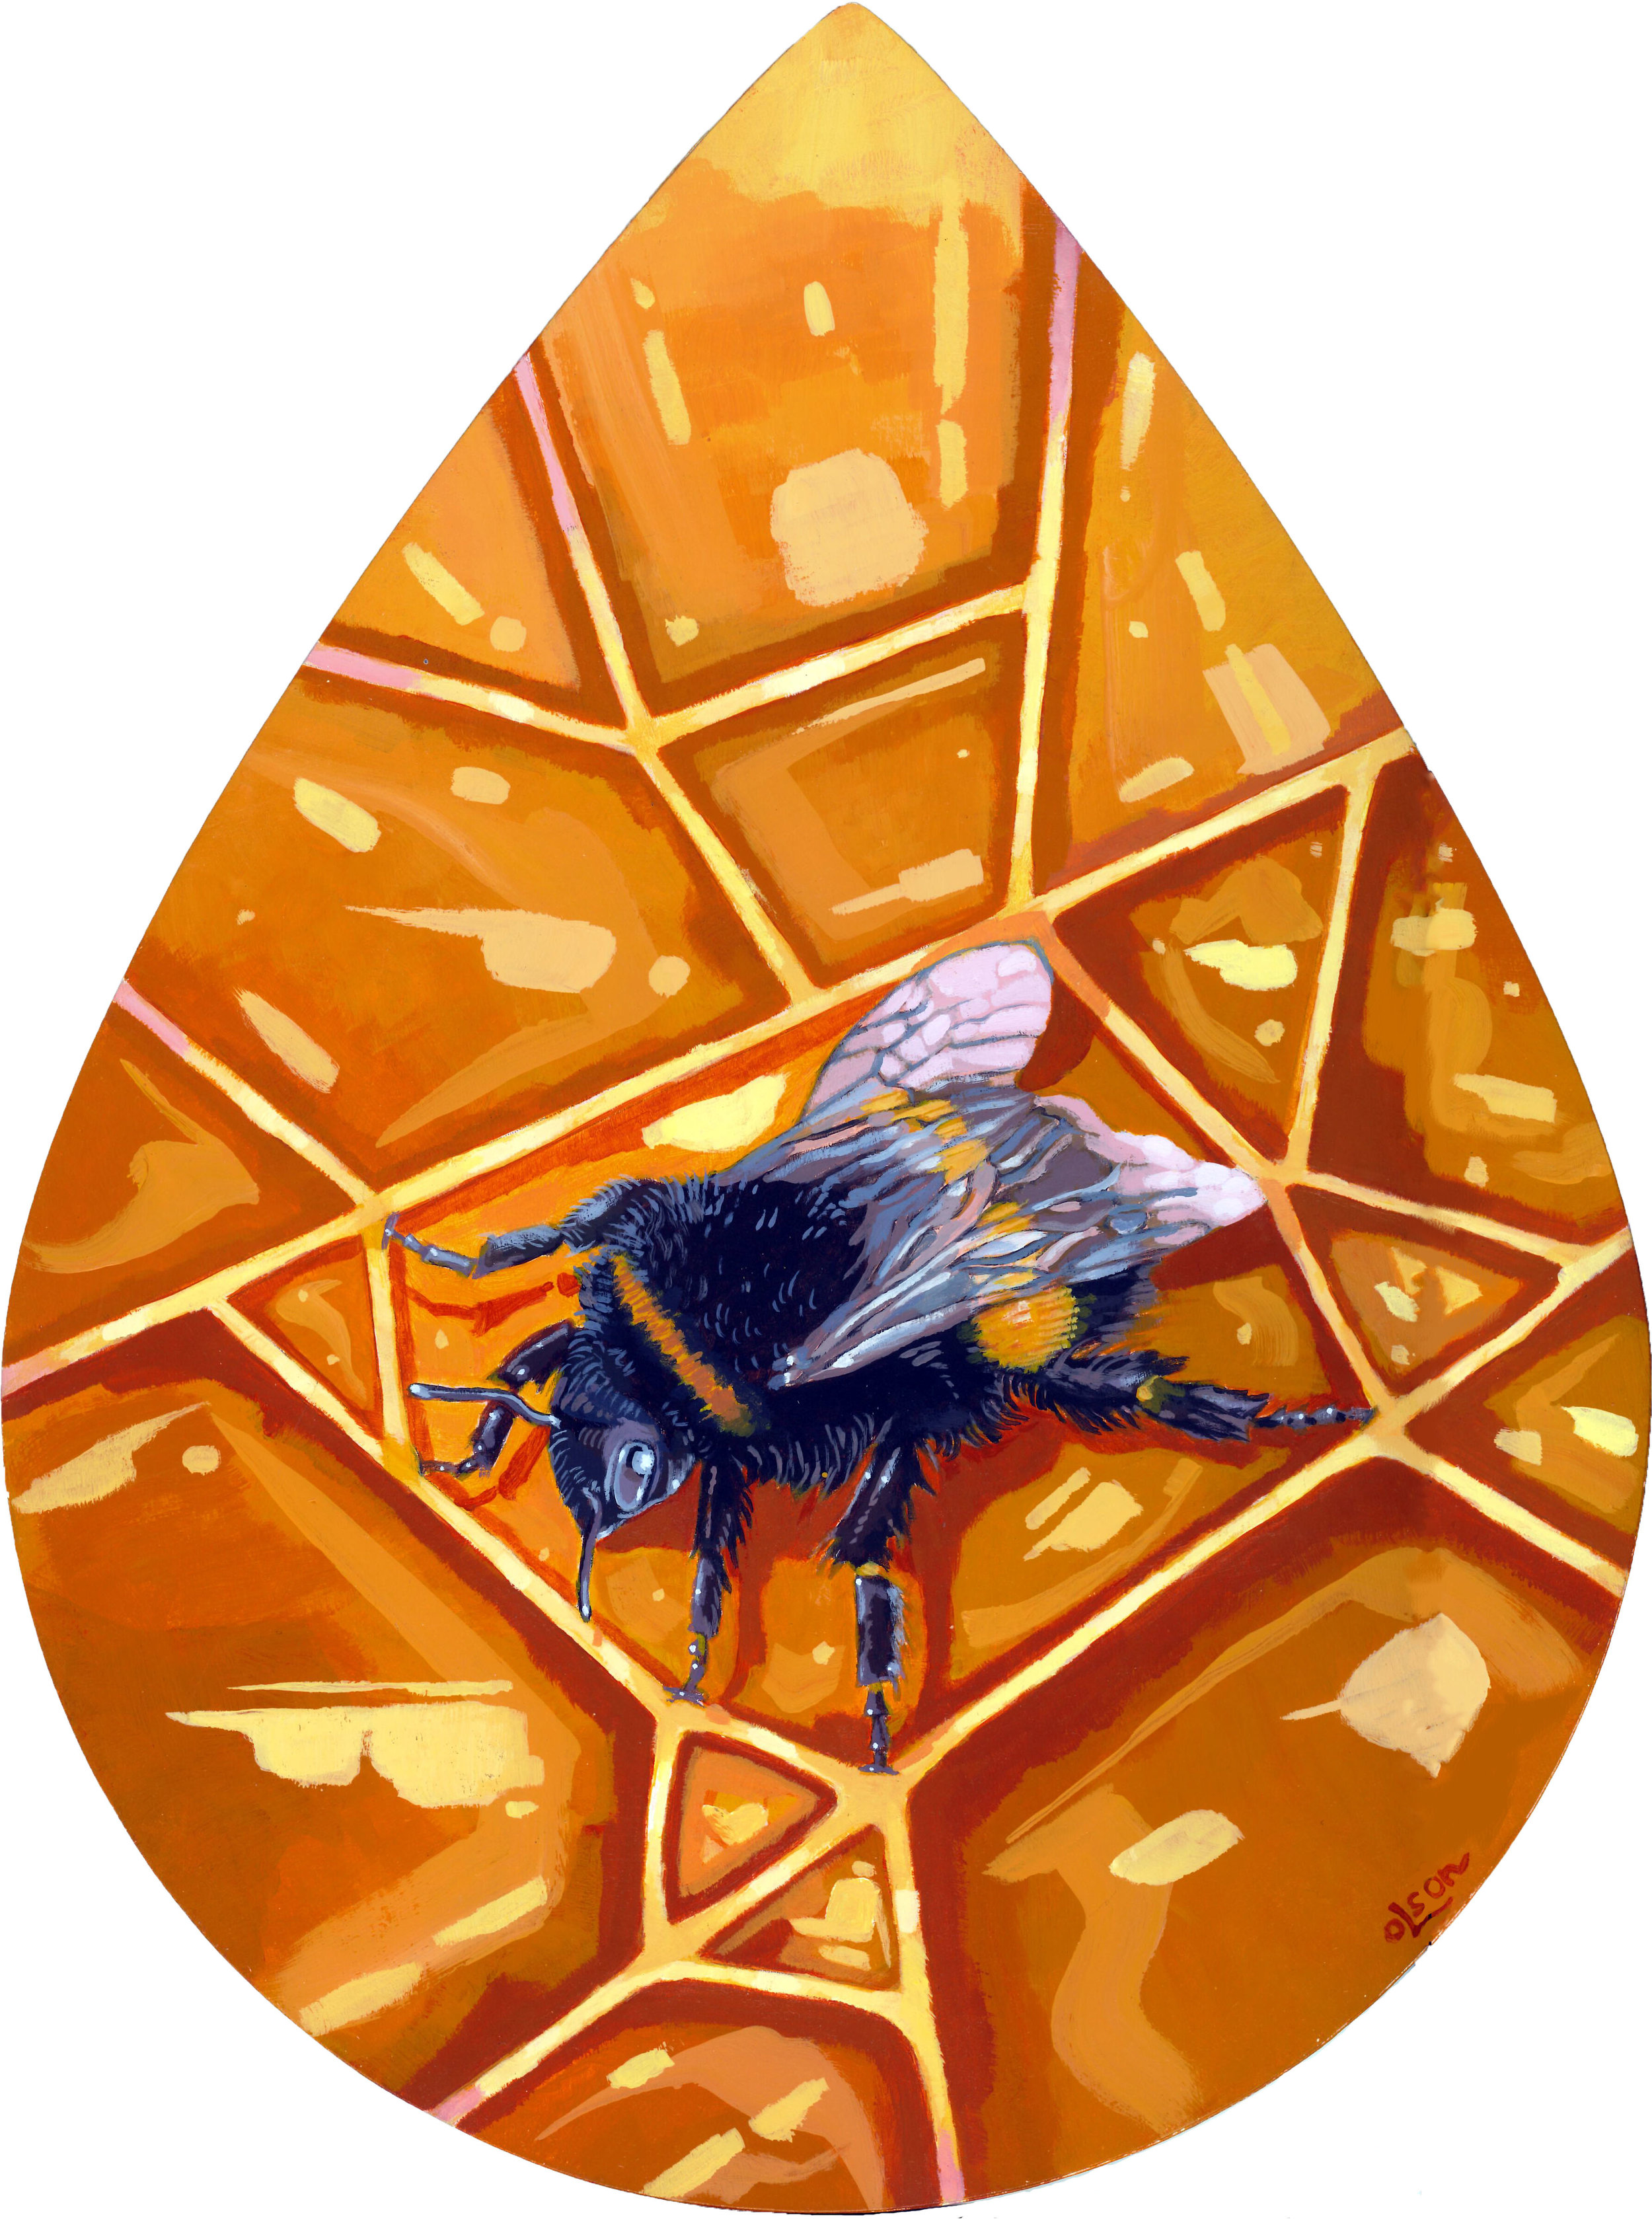 Christopher Olson-Honey Comb-Acrylic-11x14in.-2018-$400.00.jpg